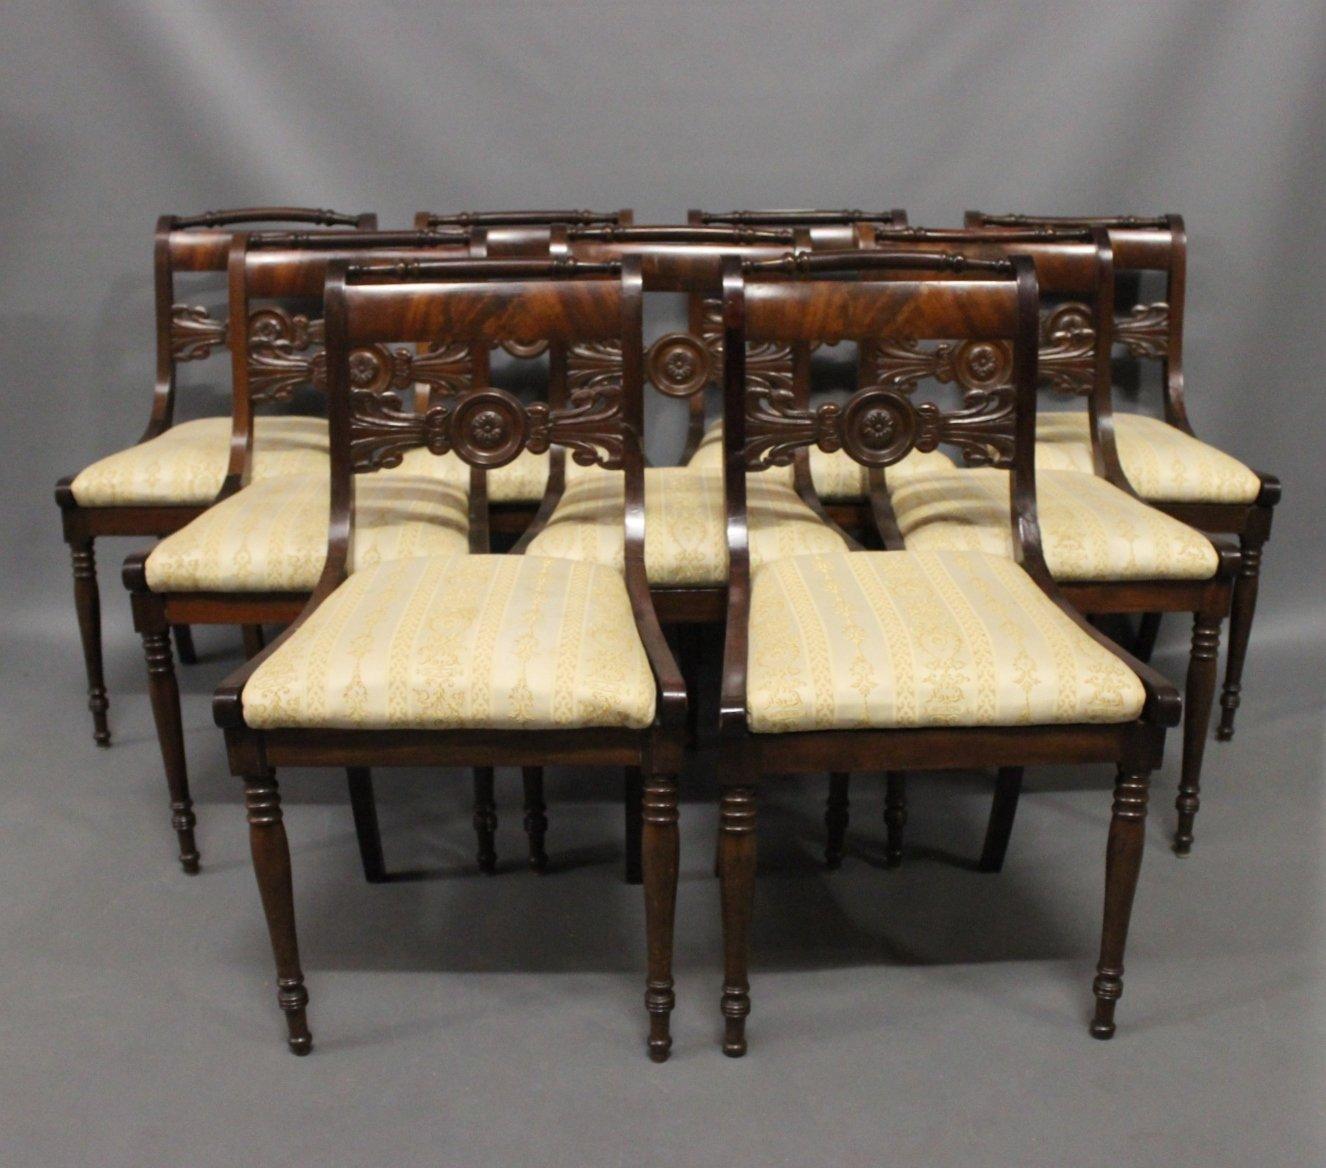 Antique Danish Chairs, 19th Century, Set of 9 - Antique Danish Chairs, 19th Century, Set Of 9 For Sale At Pamono